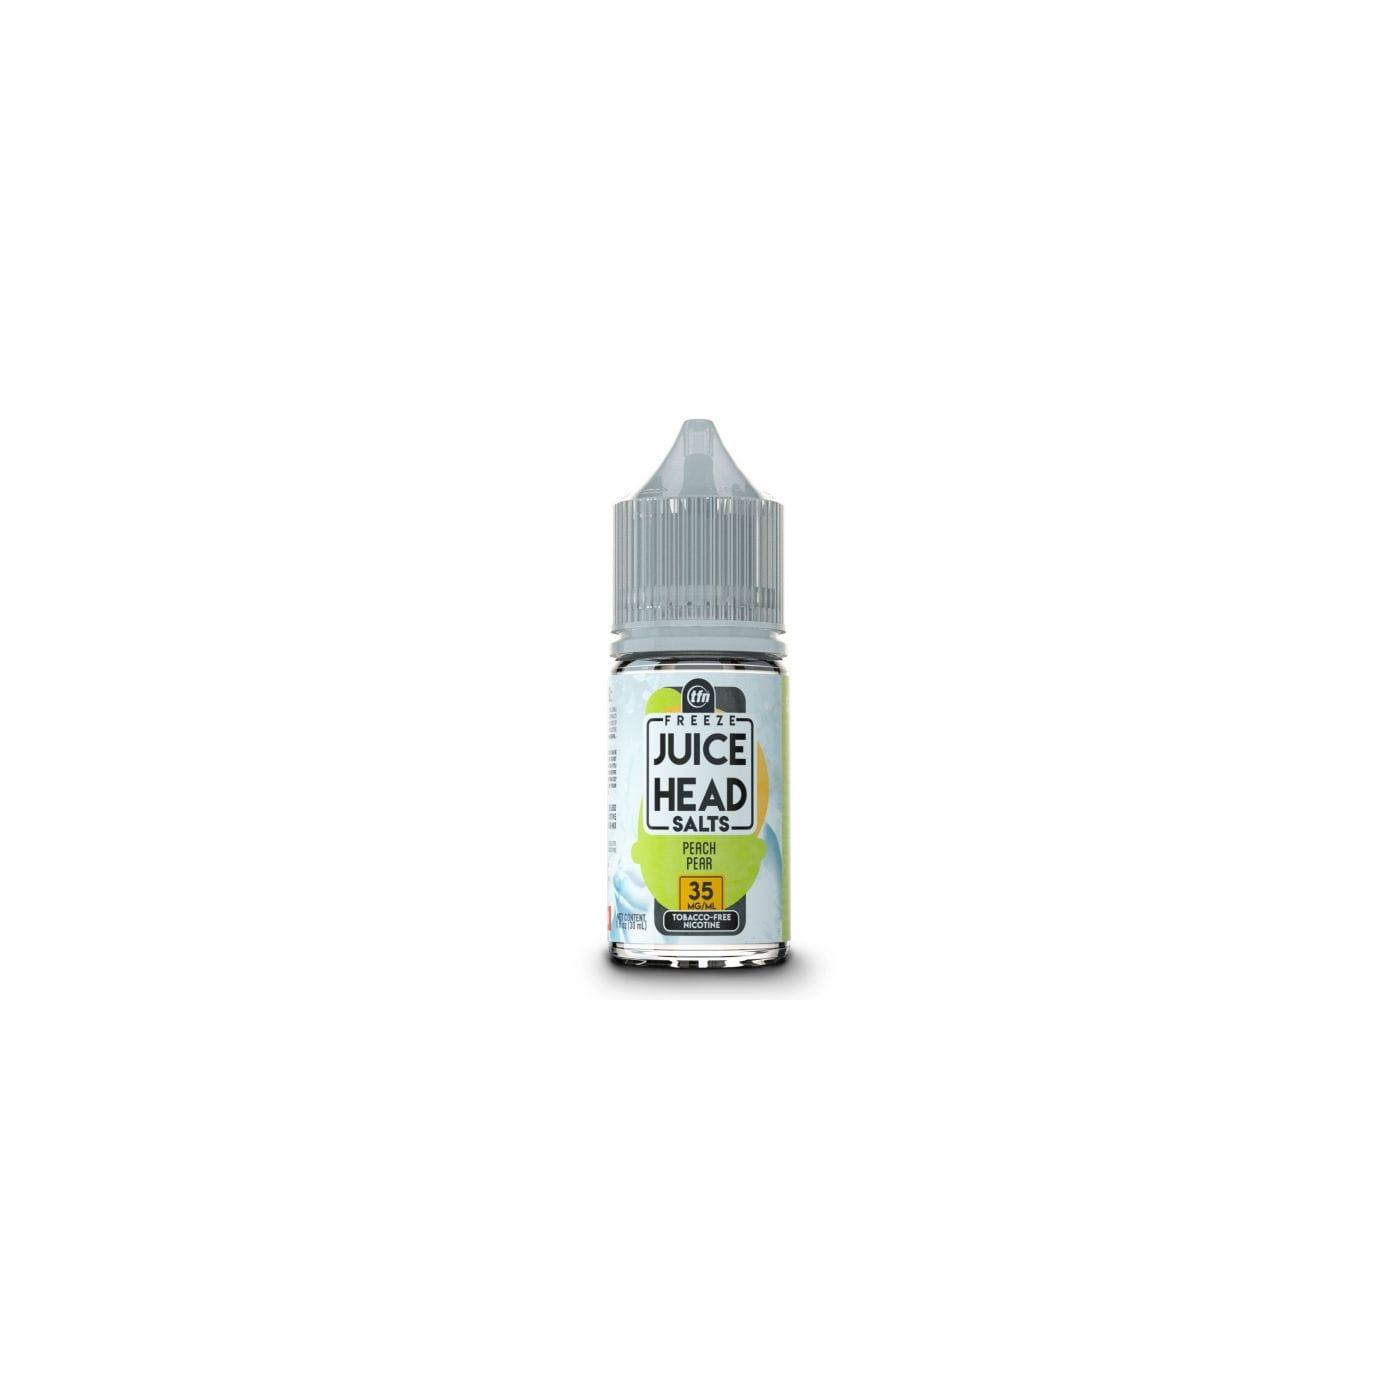 Juice Head TFN Salts Peach Pear Freeze